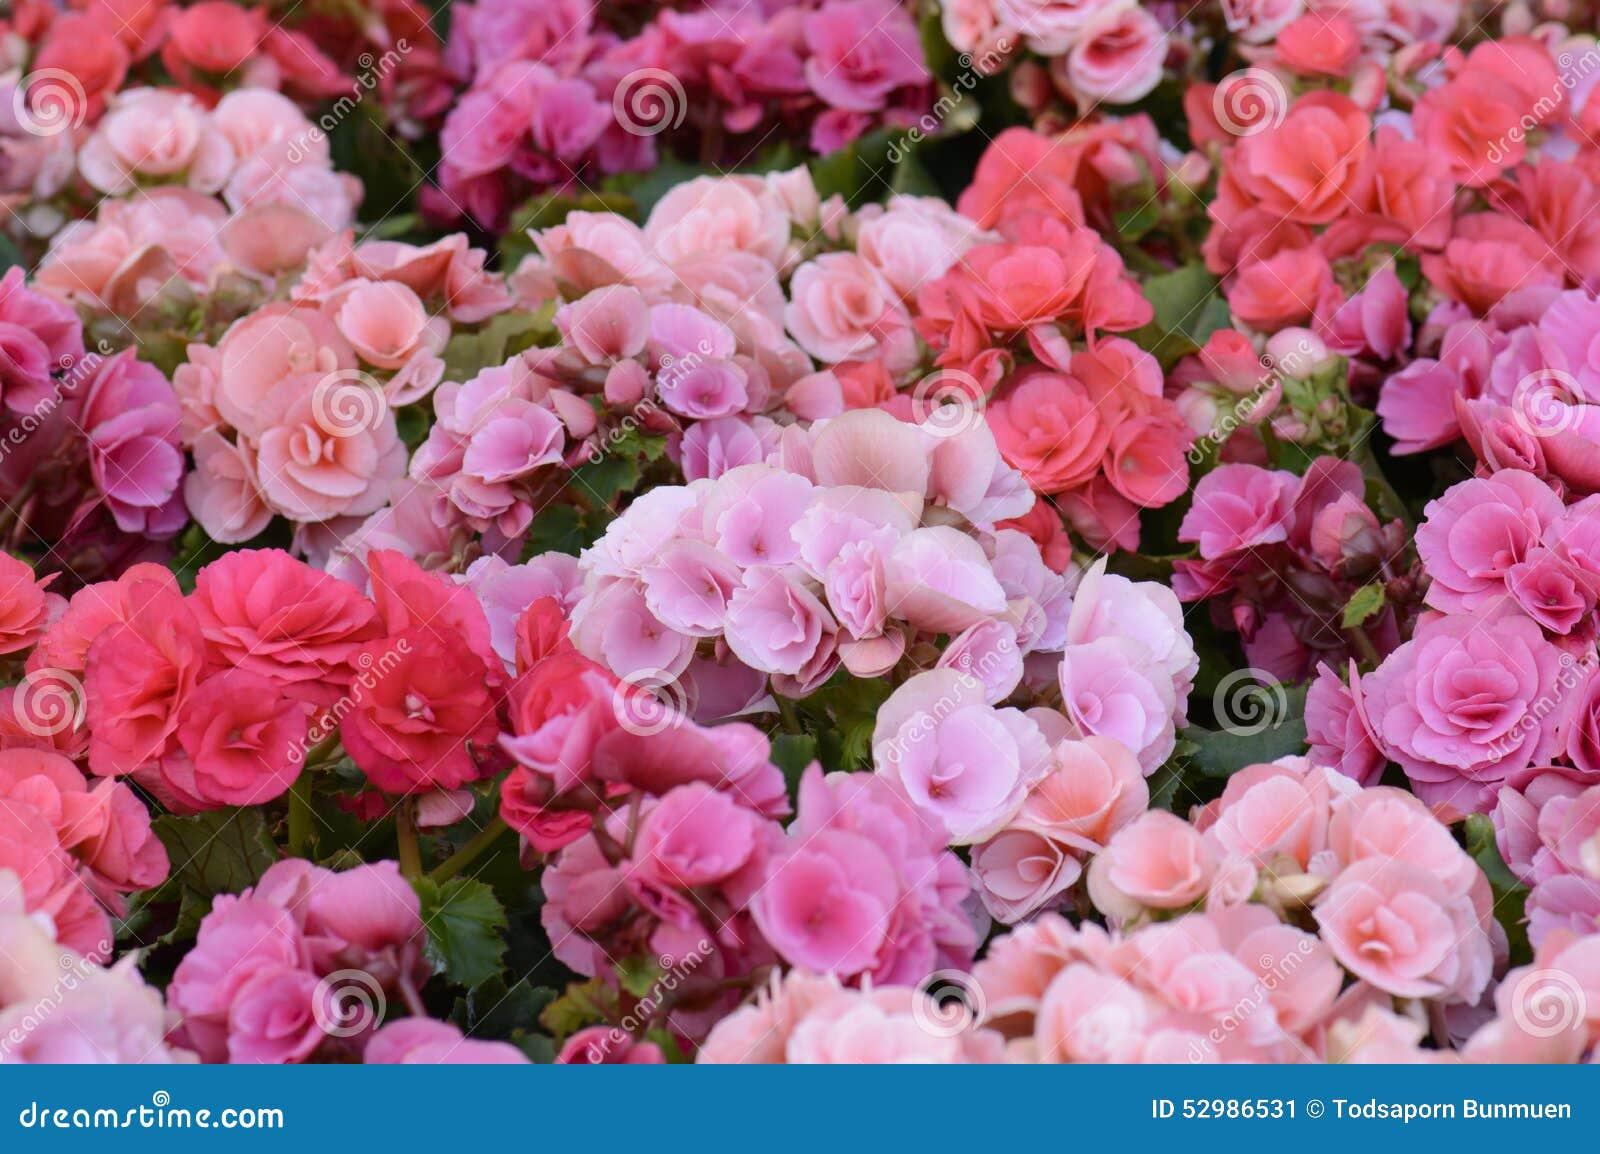 Blossfeldiana Rose De Kalanchoe Fleur De Flamber Katy Image Stock